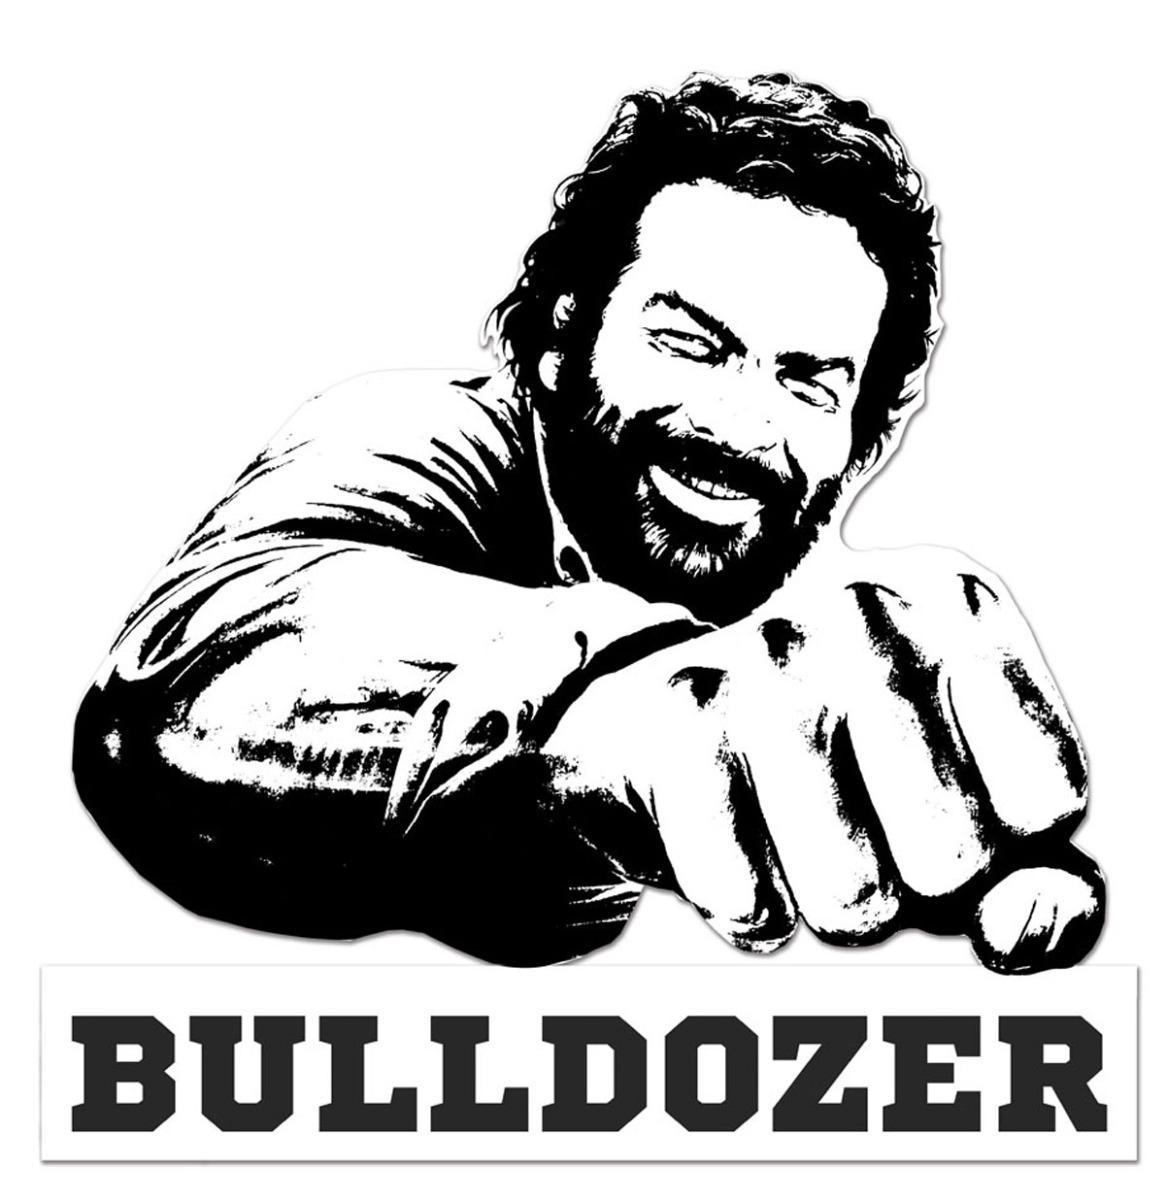 Bud Spencer Bulldozer Metalen Bord 45 x 45 cm